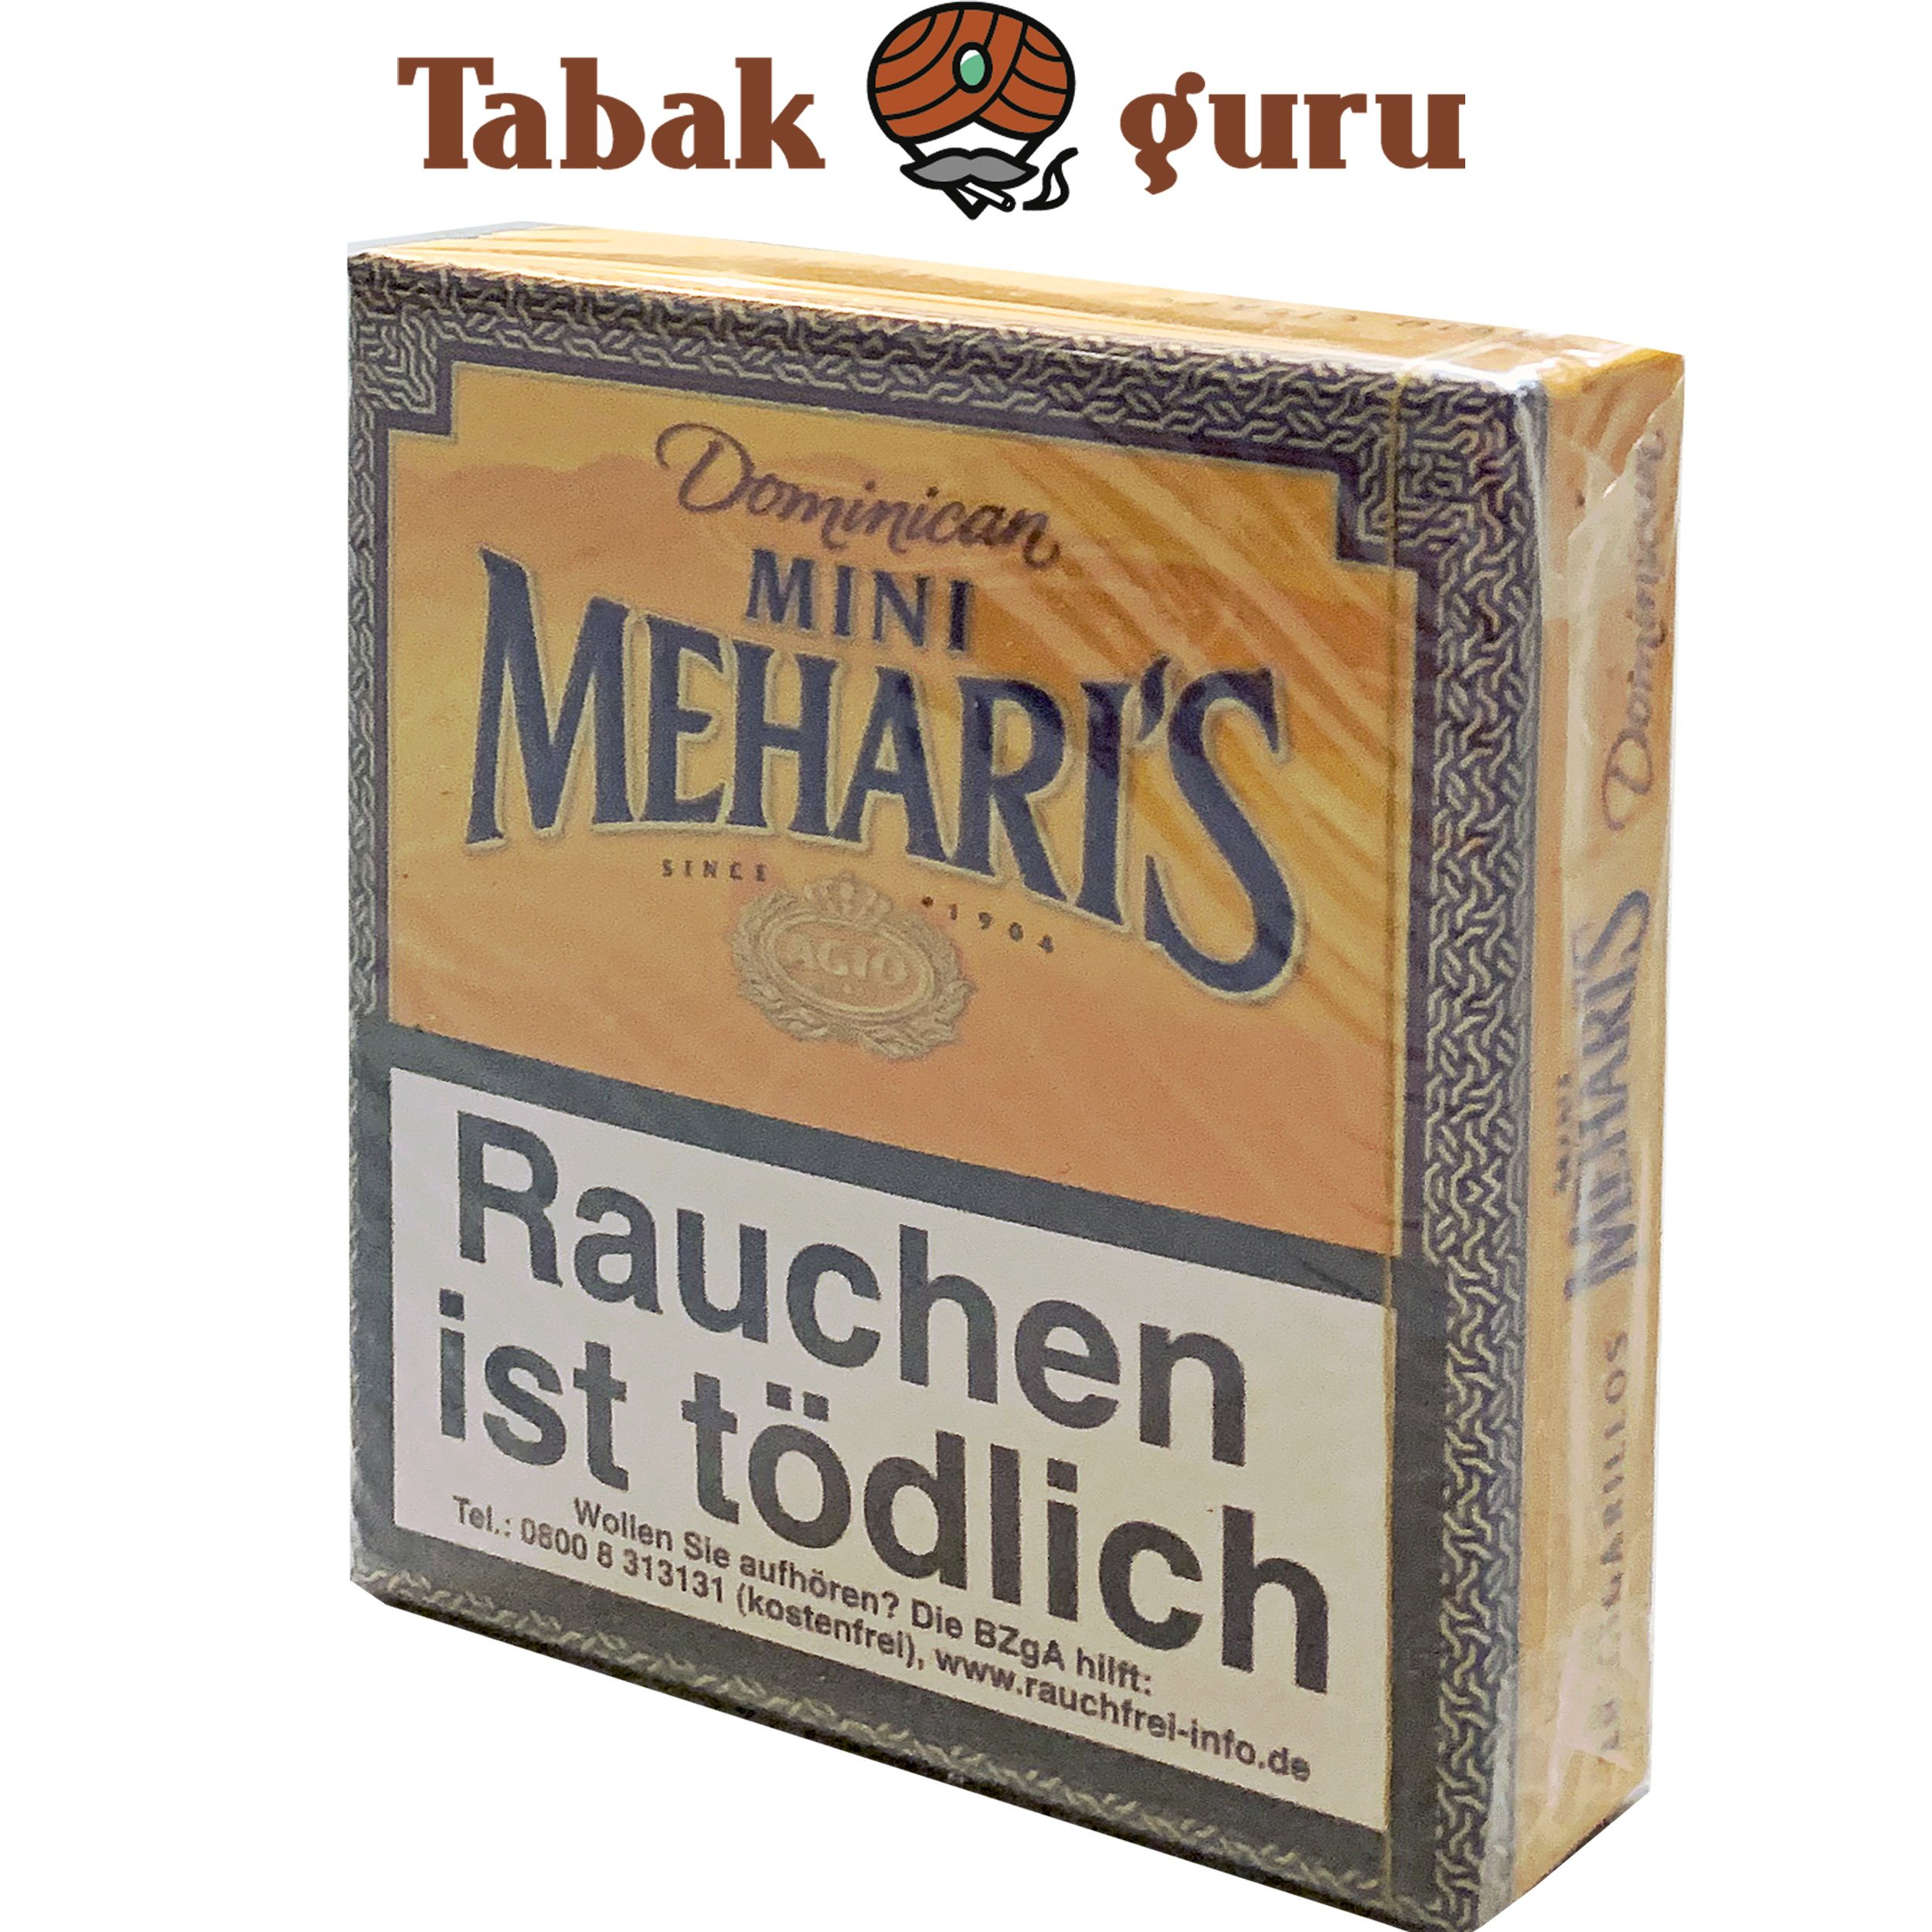 Meharis MiniDominican